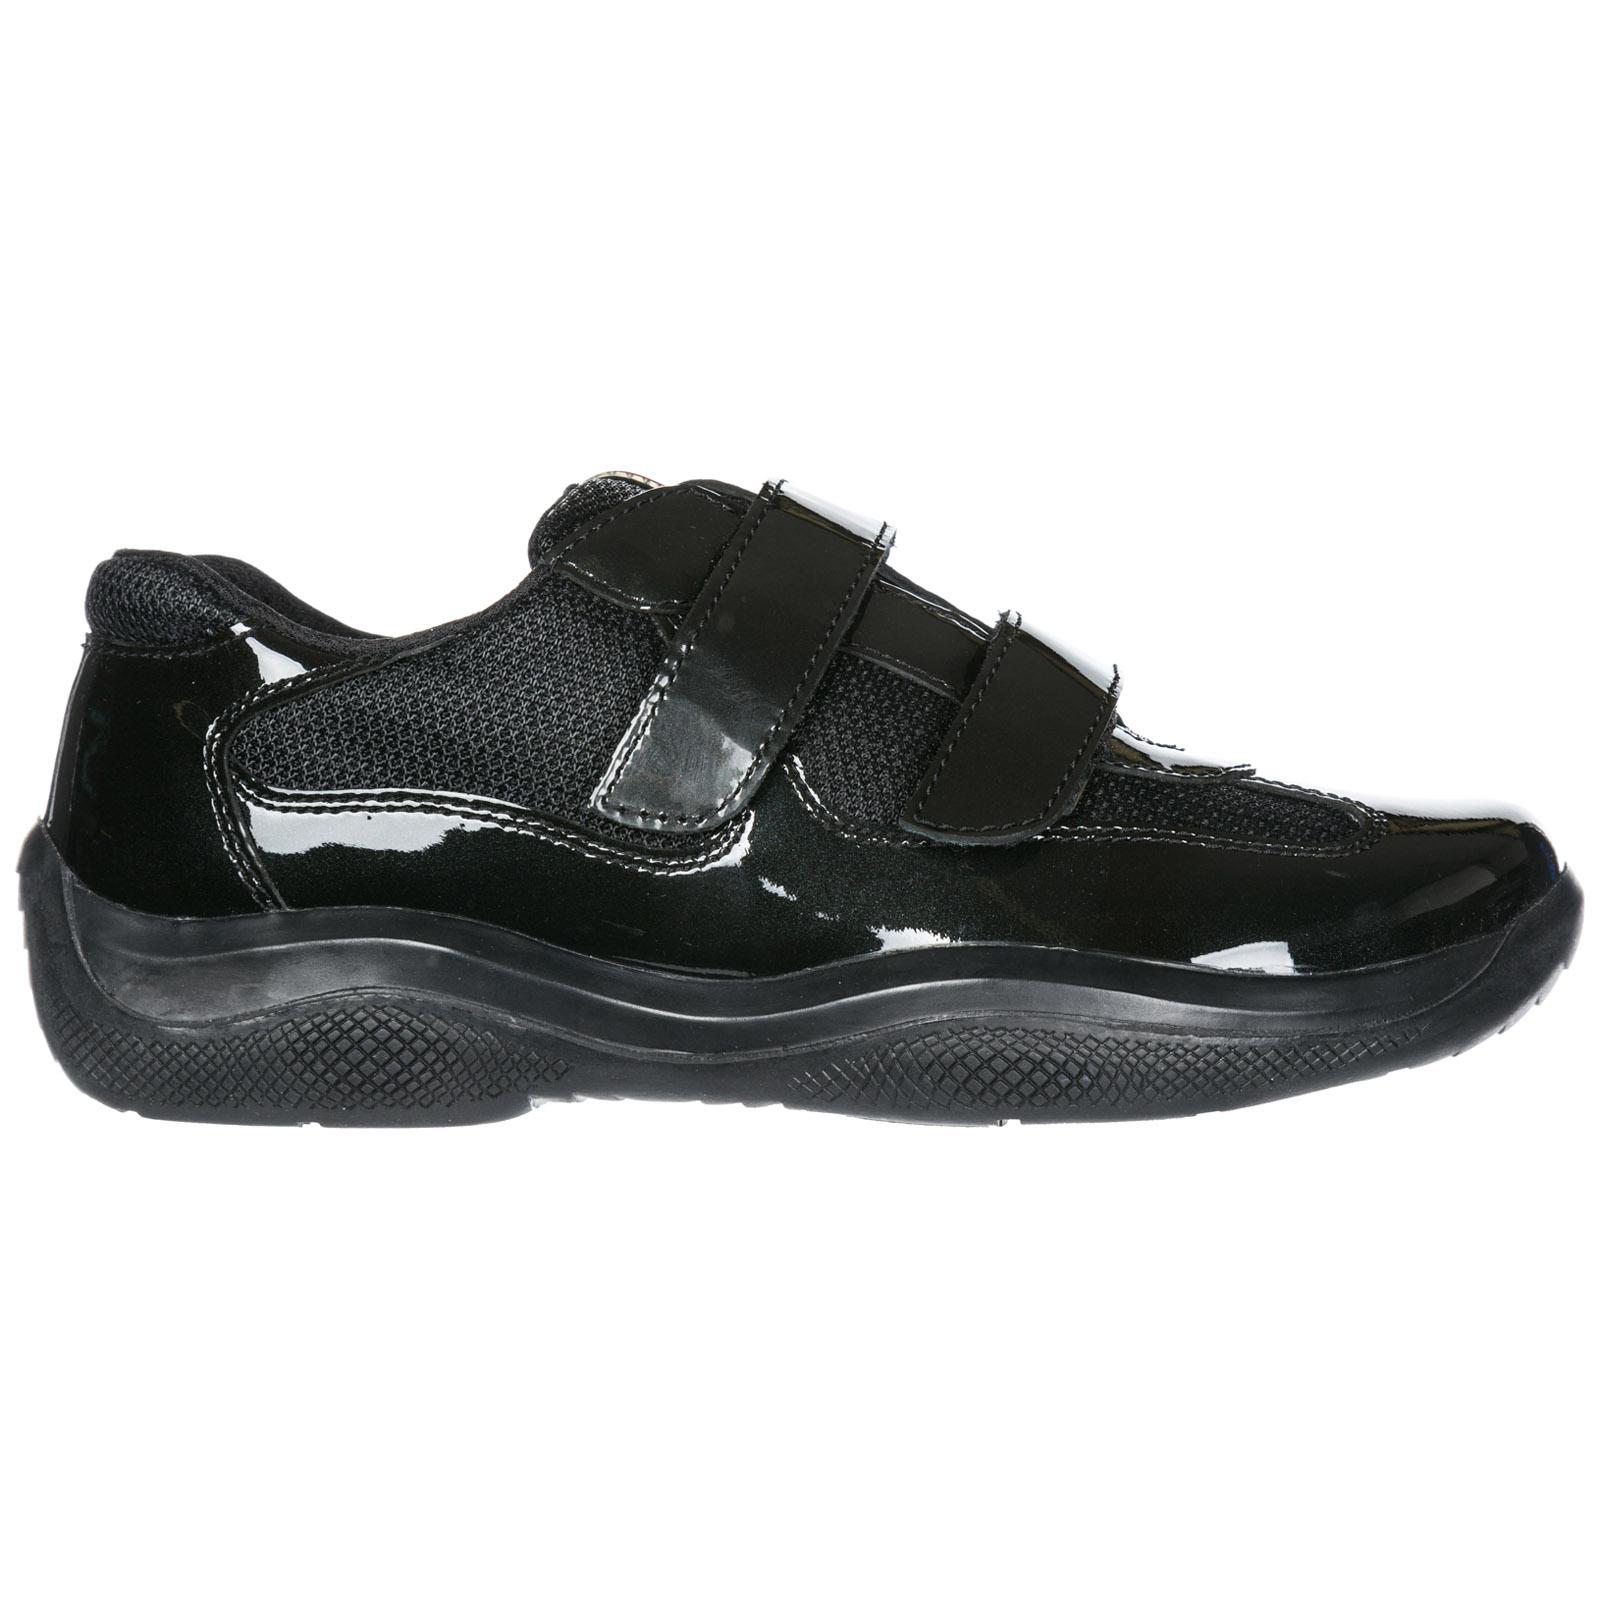 6b8f6fbc94 S Sneakers Cup Scarpe Pelle In Prada pgwqanBpf Donna America TzCOnBxB